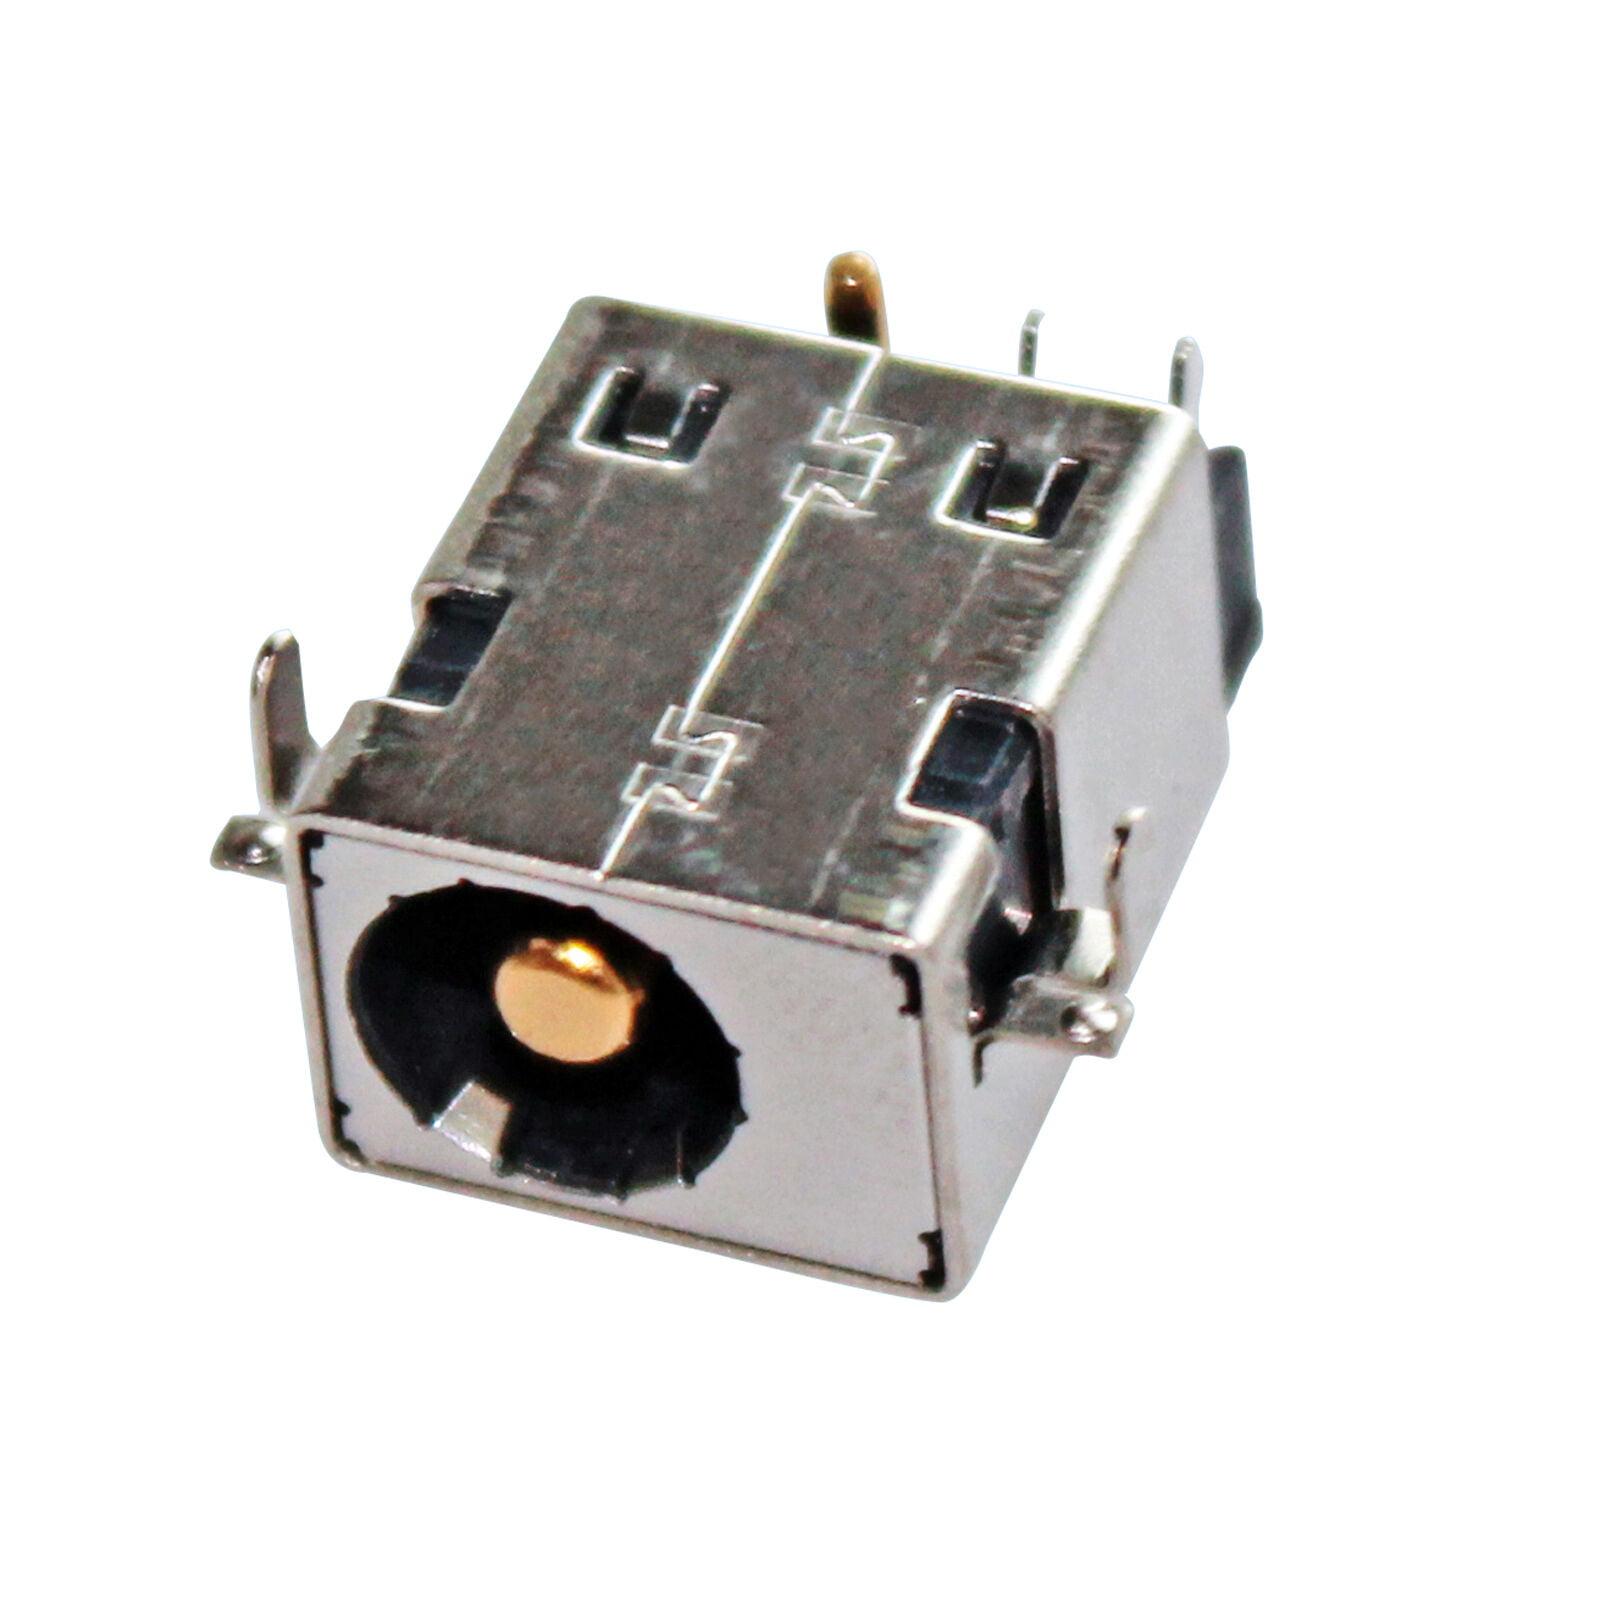 ASUS X75A X75SV X75VC X75VD X75VB DC IN Jack Power Button Charging Port Board